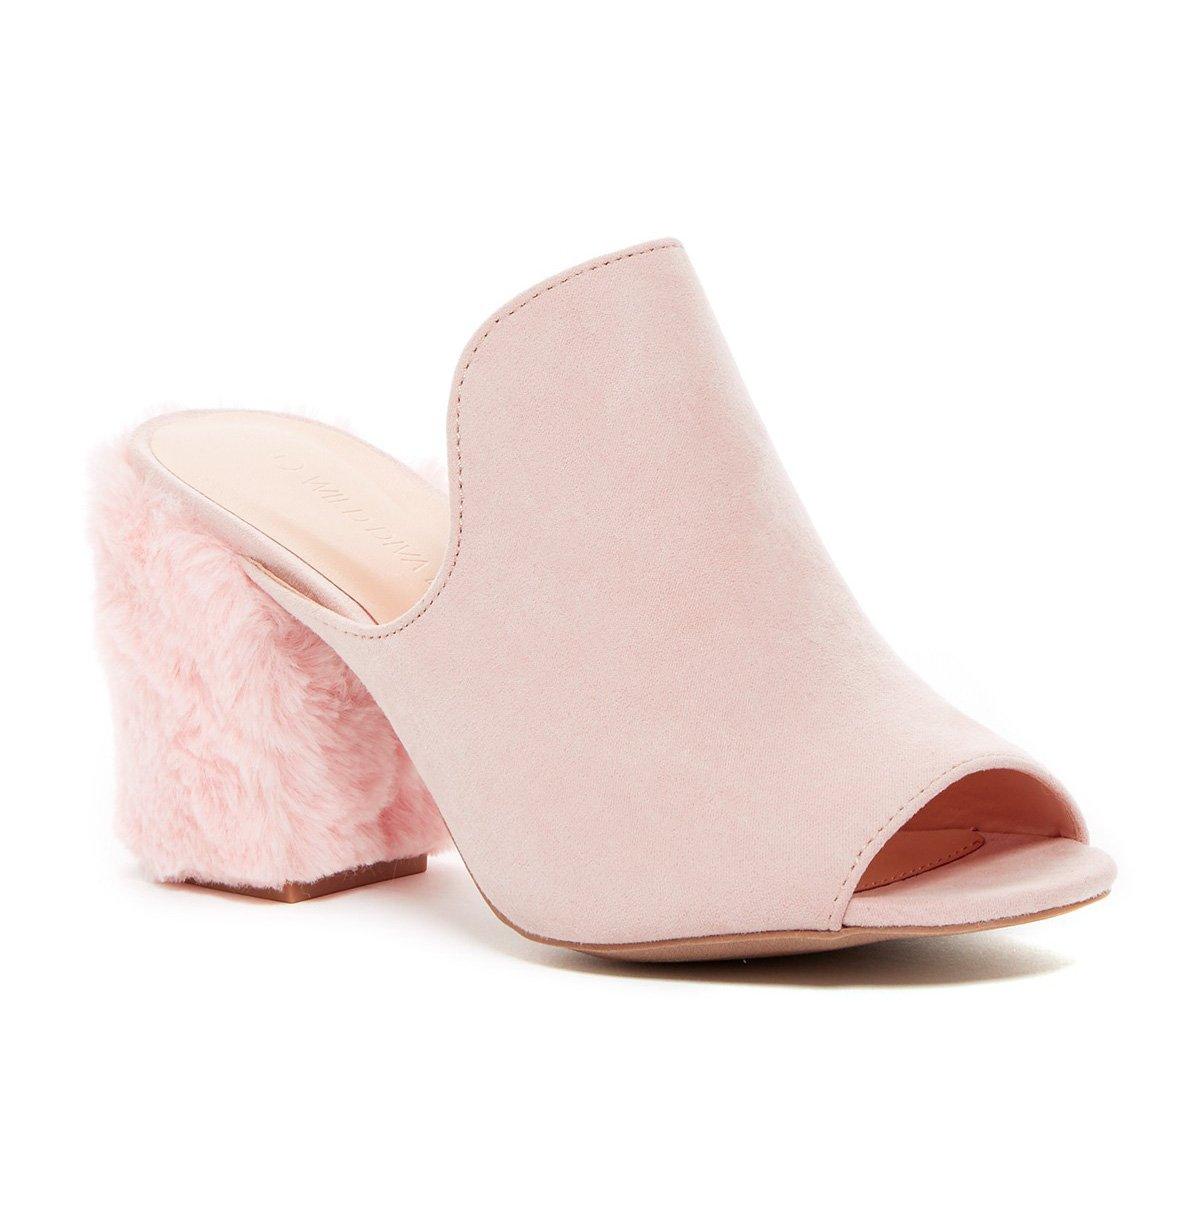 Wild Diva Women's Slip-On Peep-Toe Fur Block Heel Mule in Nude Size: 10